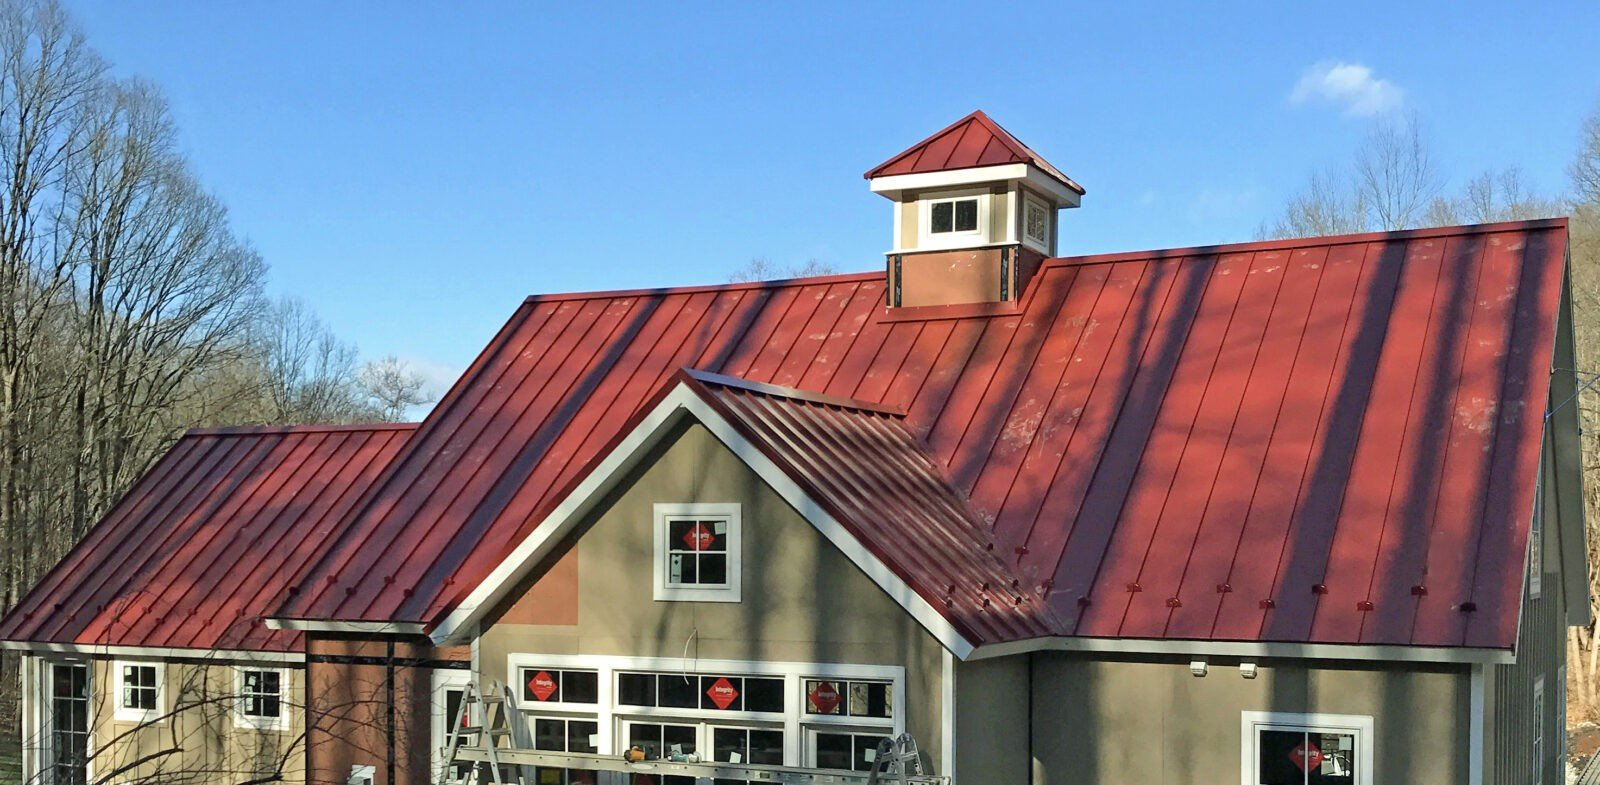 100 Small Barn Homes Tiny Home Ideas Google Search